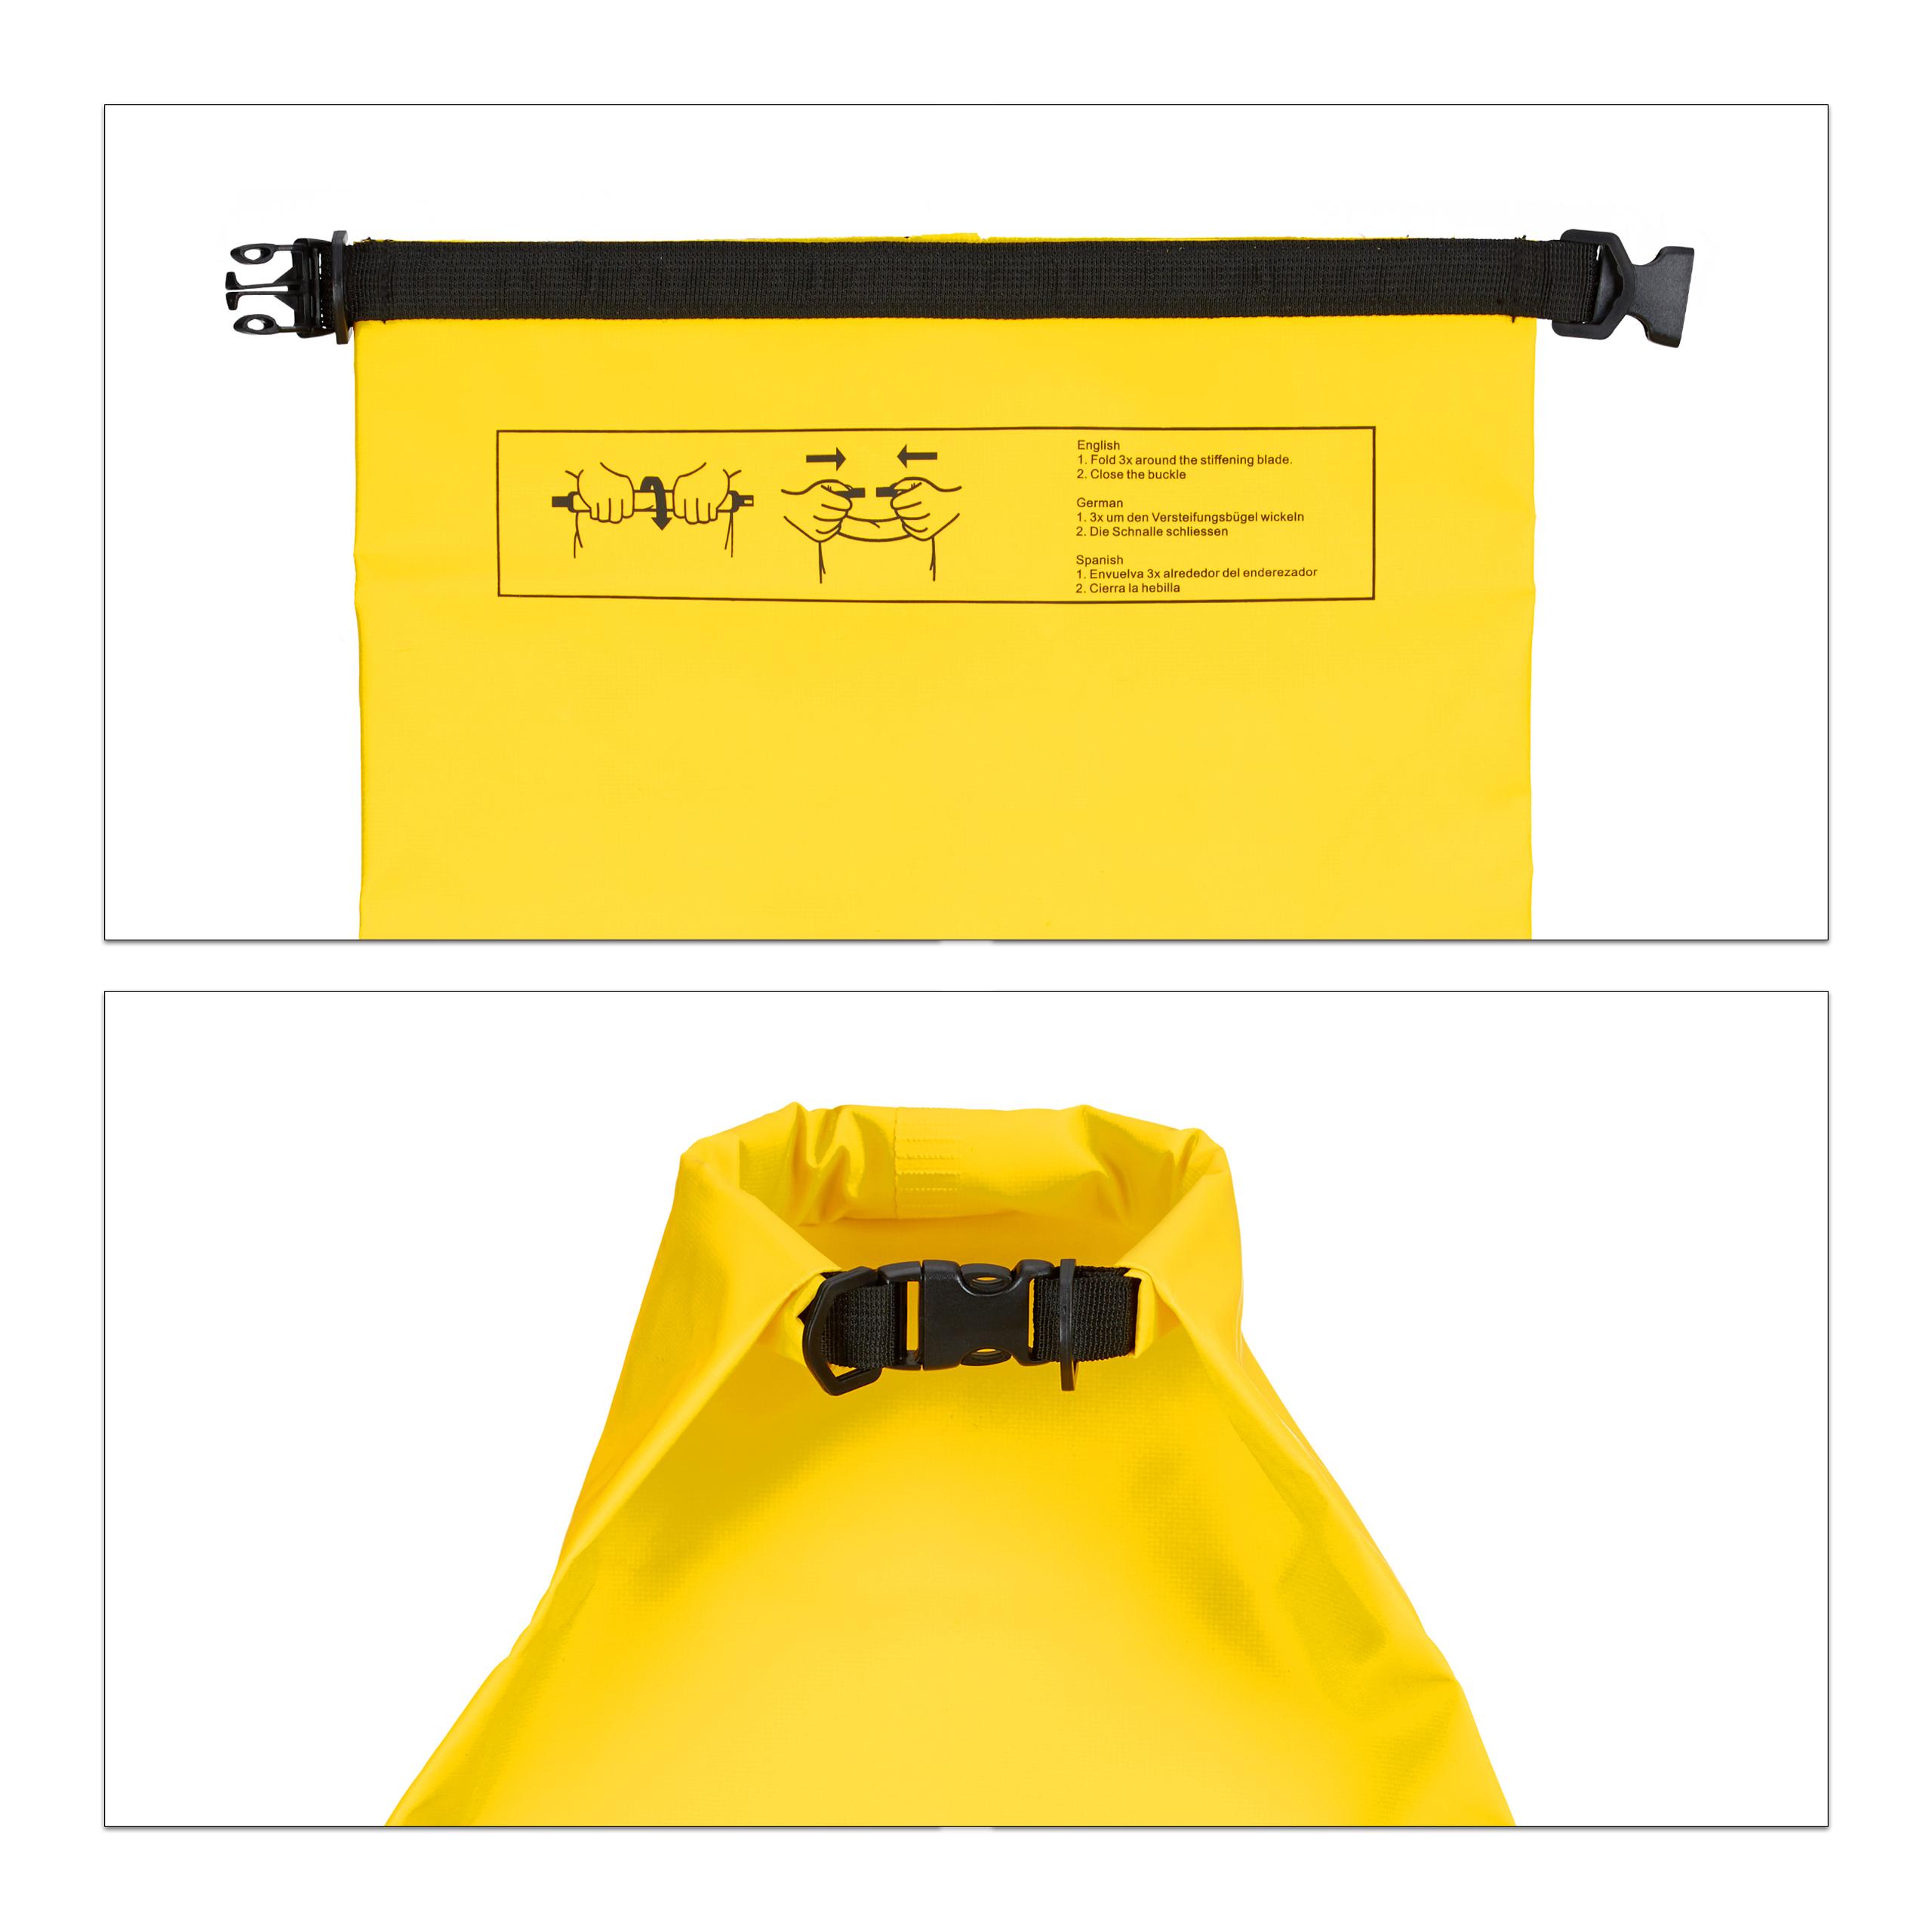 Ocean Pack 20 Liter Dry Bag Outdoor Packsack wasserdicht Seesack Seemannssack